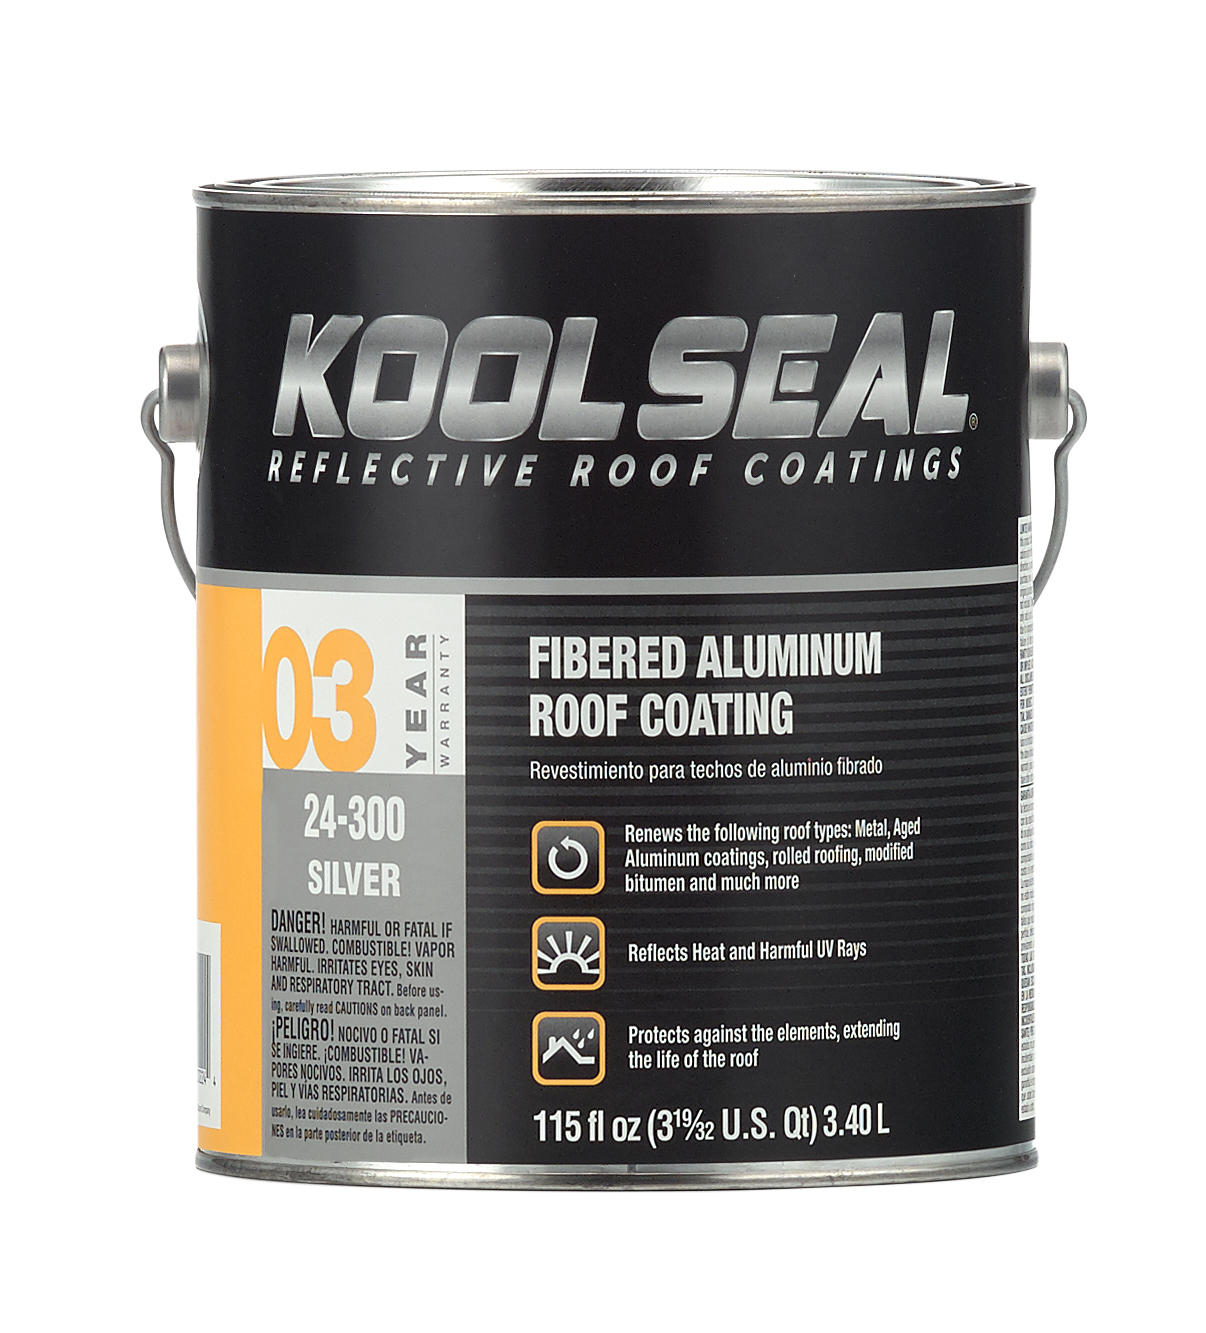 Fibered Aluminum Roof Coating Koolseal